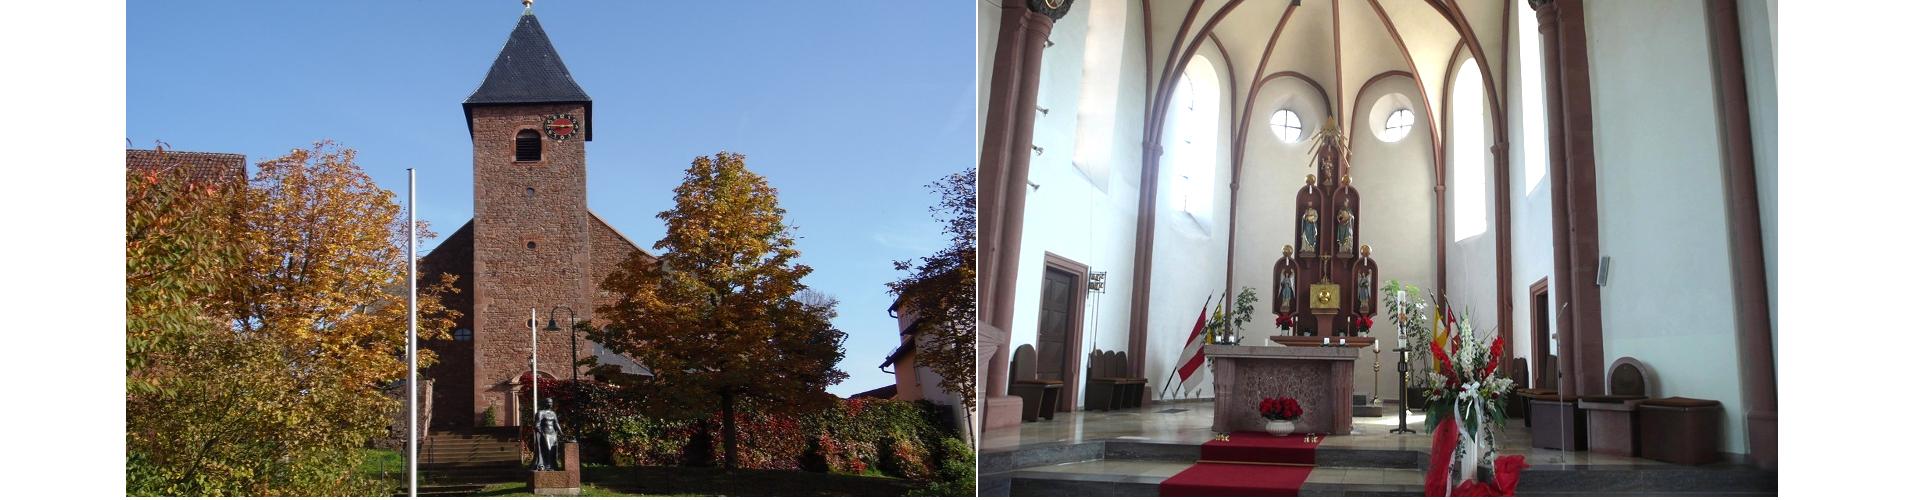 Kirche-Geiselbach-Slider